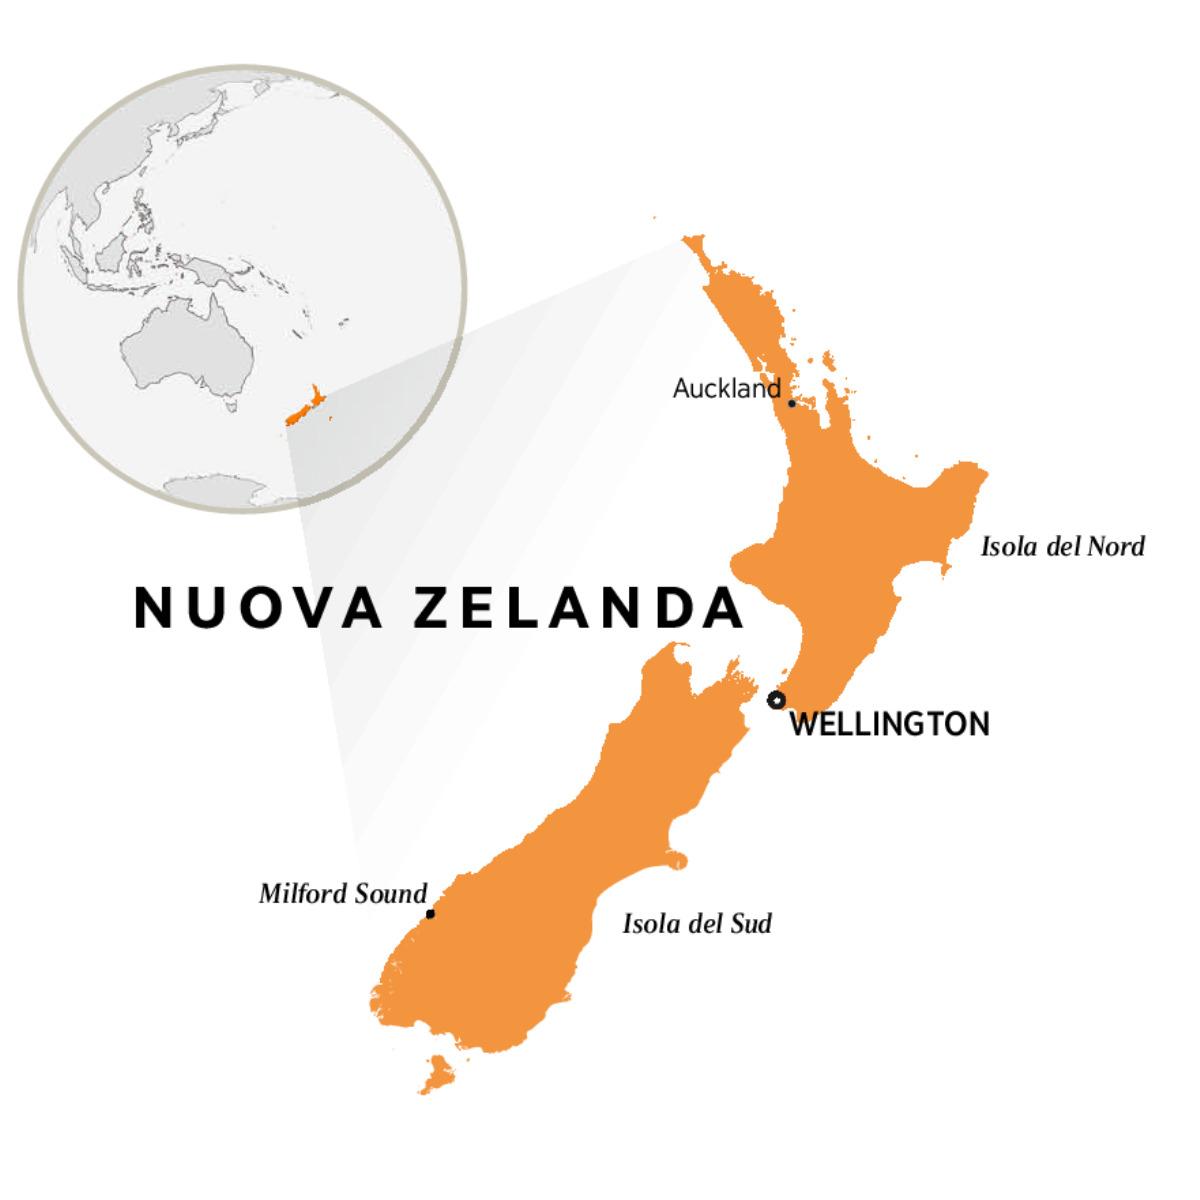 Nuova Zelanda Cartina Mondo.Una Visita In Nuova Zelanda Genti E Paesi